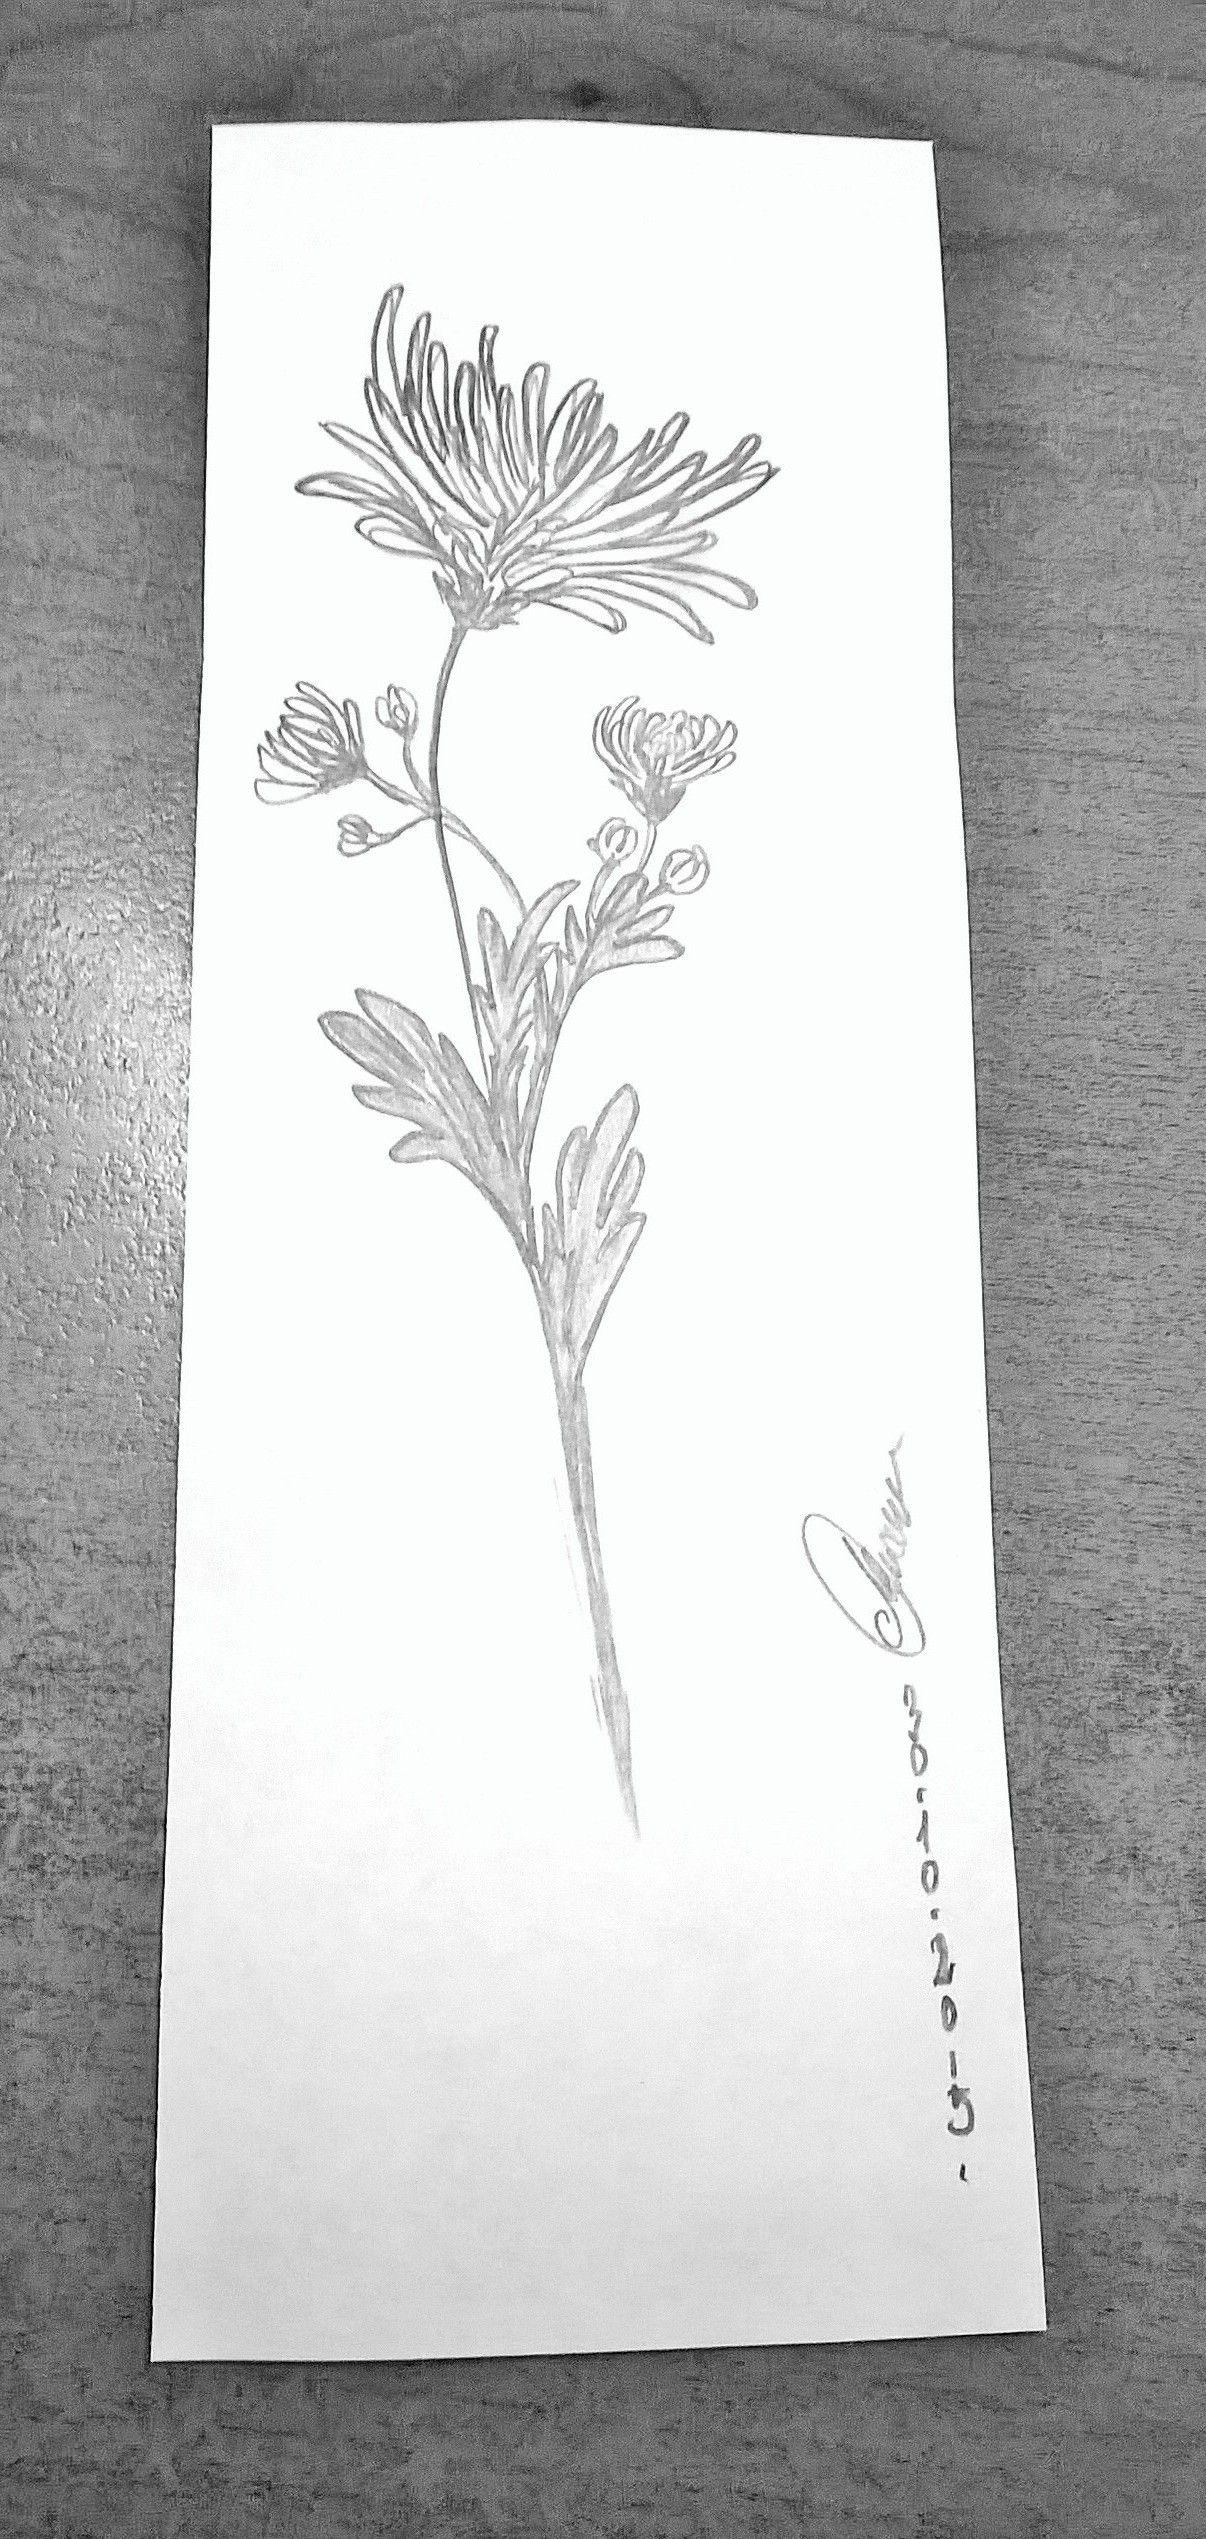 Chrysanthemum Chrysanthemum tattoo, Mum tattoo, Birth